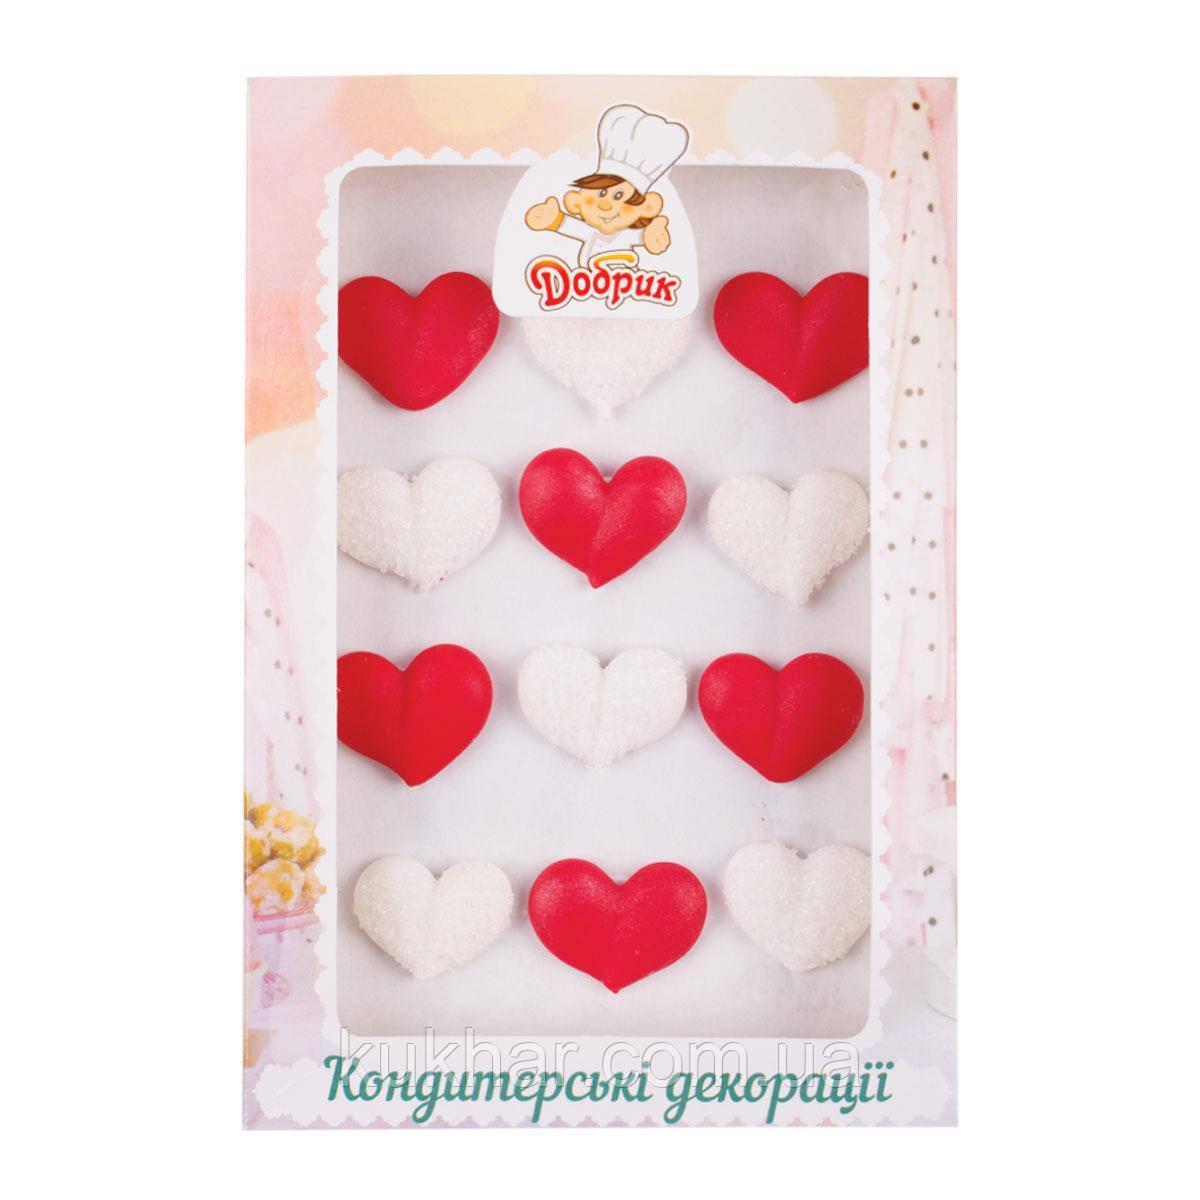 Украшения на торт капкейк Сердечка №2